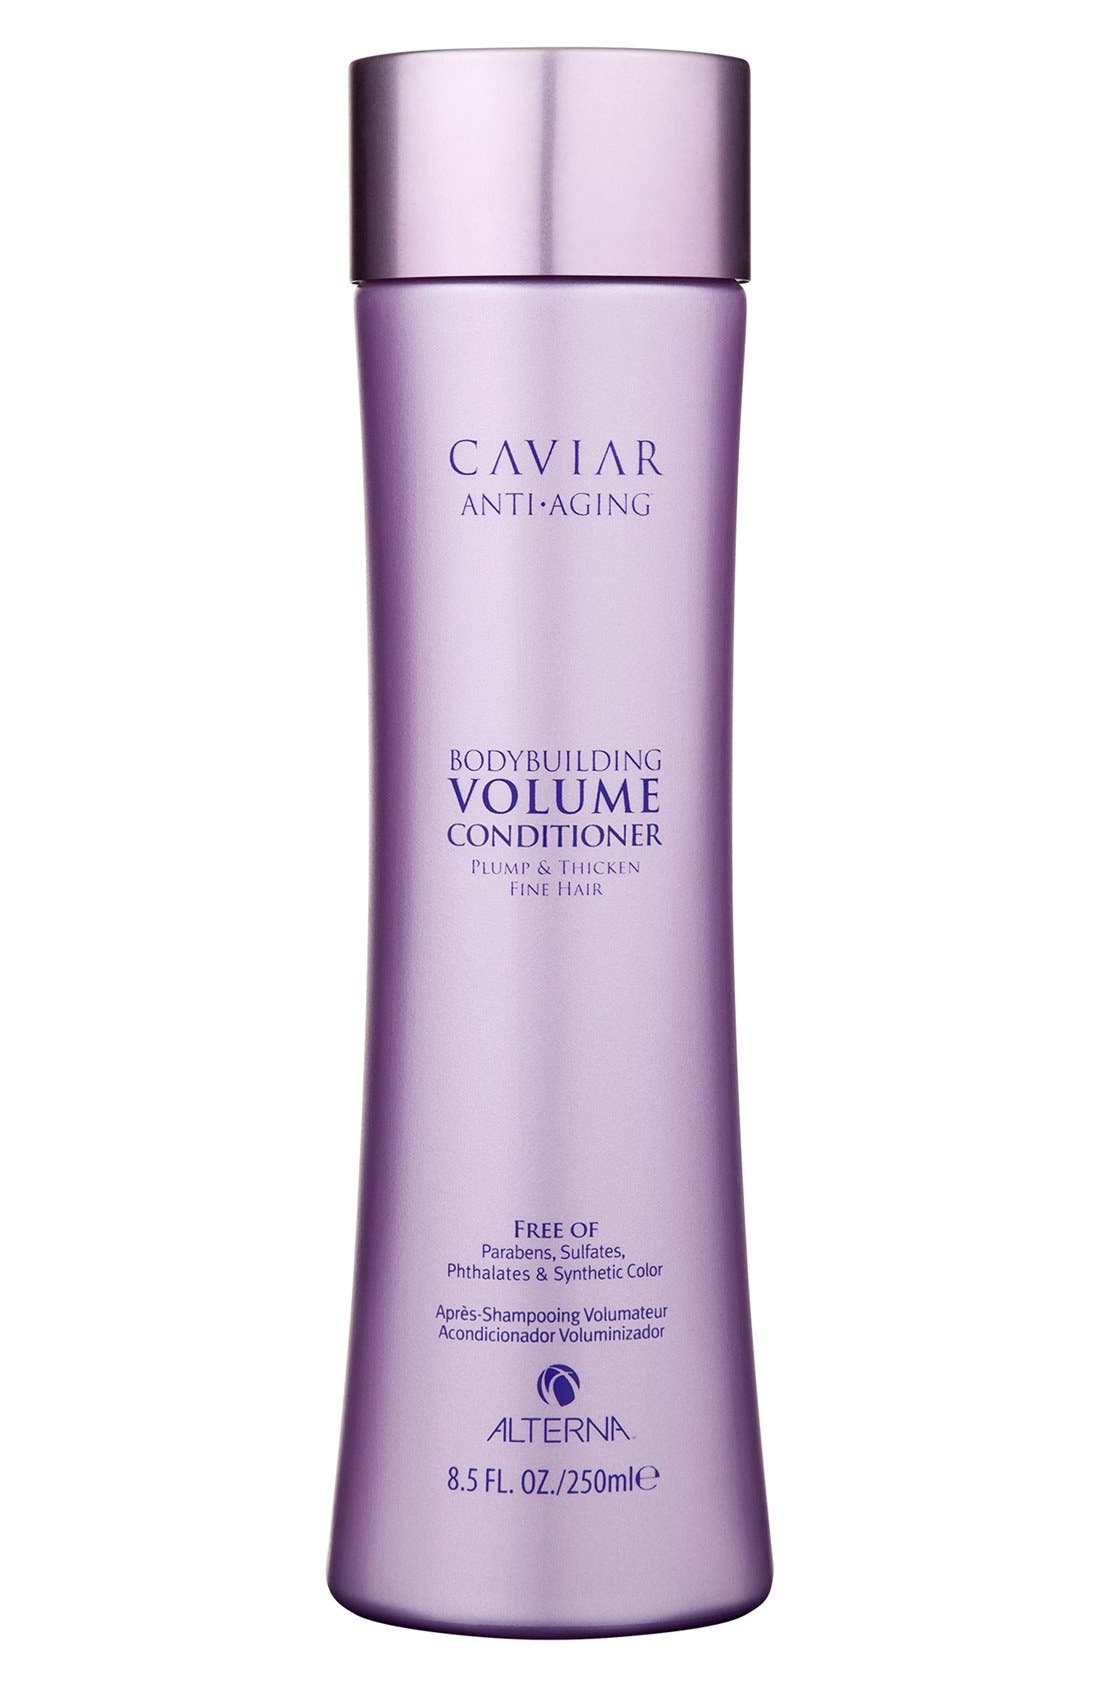 ALTERNA® Caviar Anti-Aging Bodybuilding Volume Conditioner